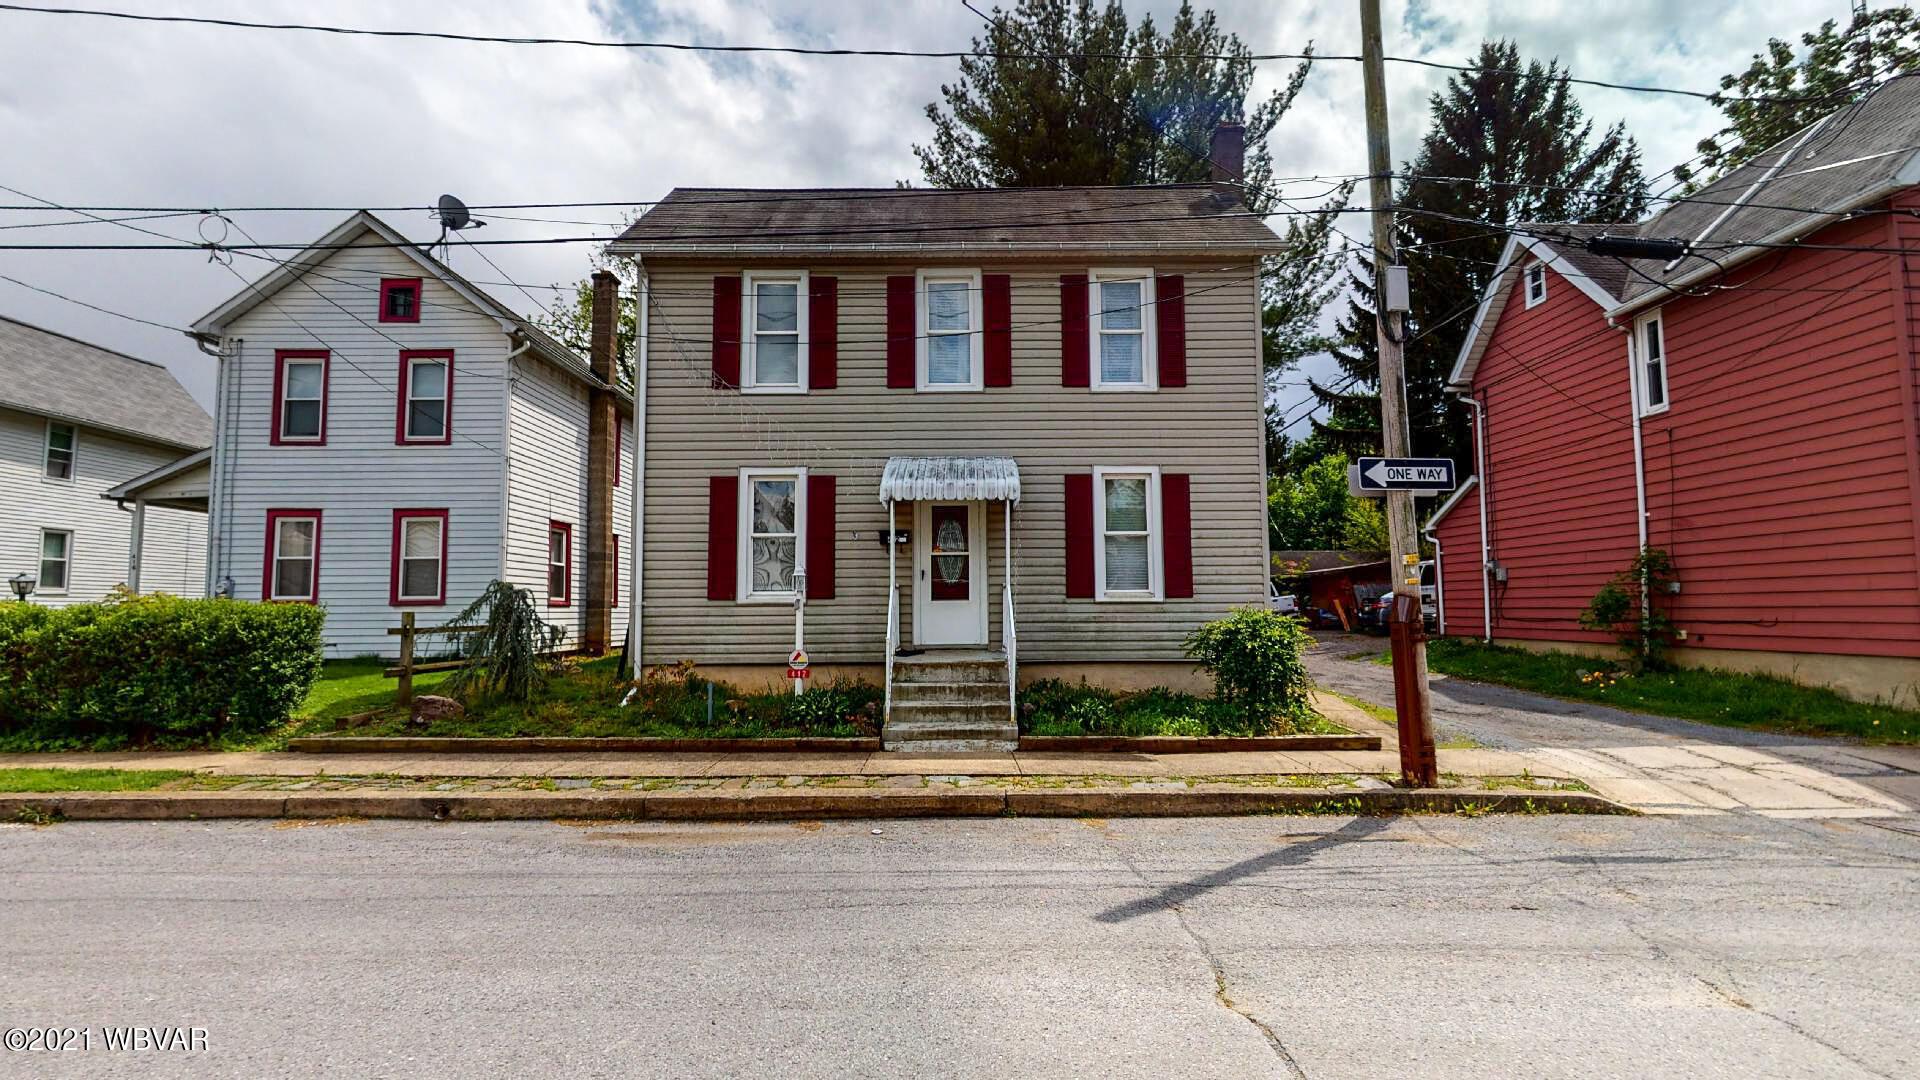 412 GERMANIA STREET, Williamsport, PA 17701, 4 Bedrooms Bedrooms, ,1 BathroomBathrooms,Residential,For sale,GERMANIA,WB-92500